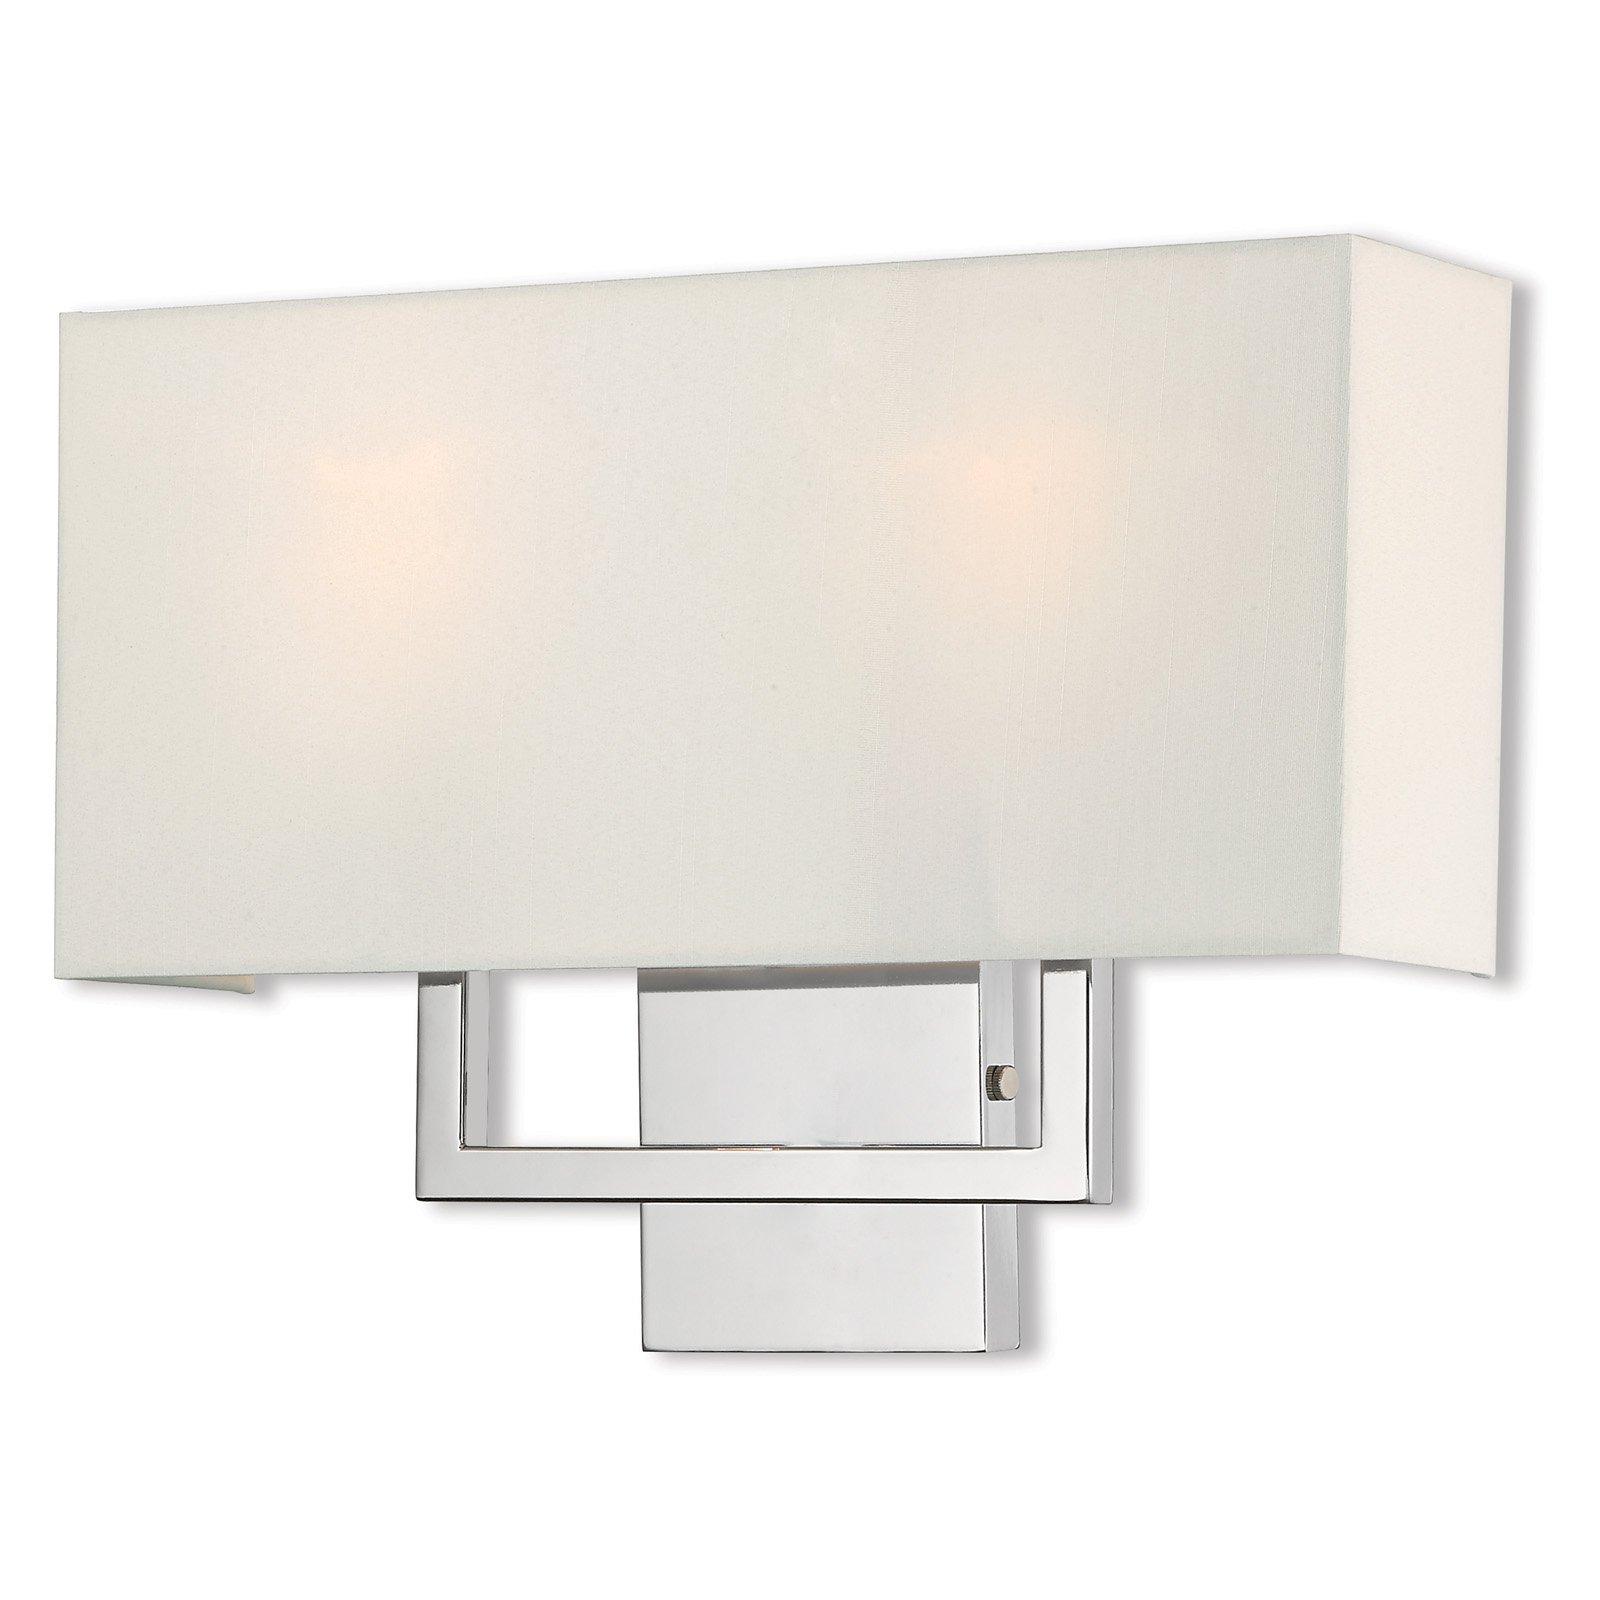 Livex Lighting Pierson 2 Light ADA Wall Sconce by Livex Lighting, Inc.